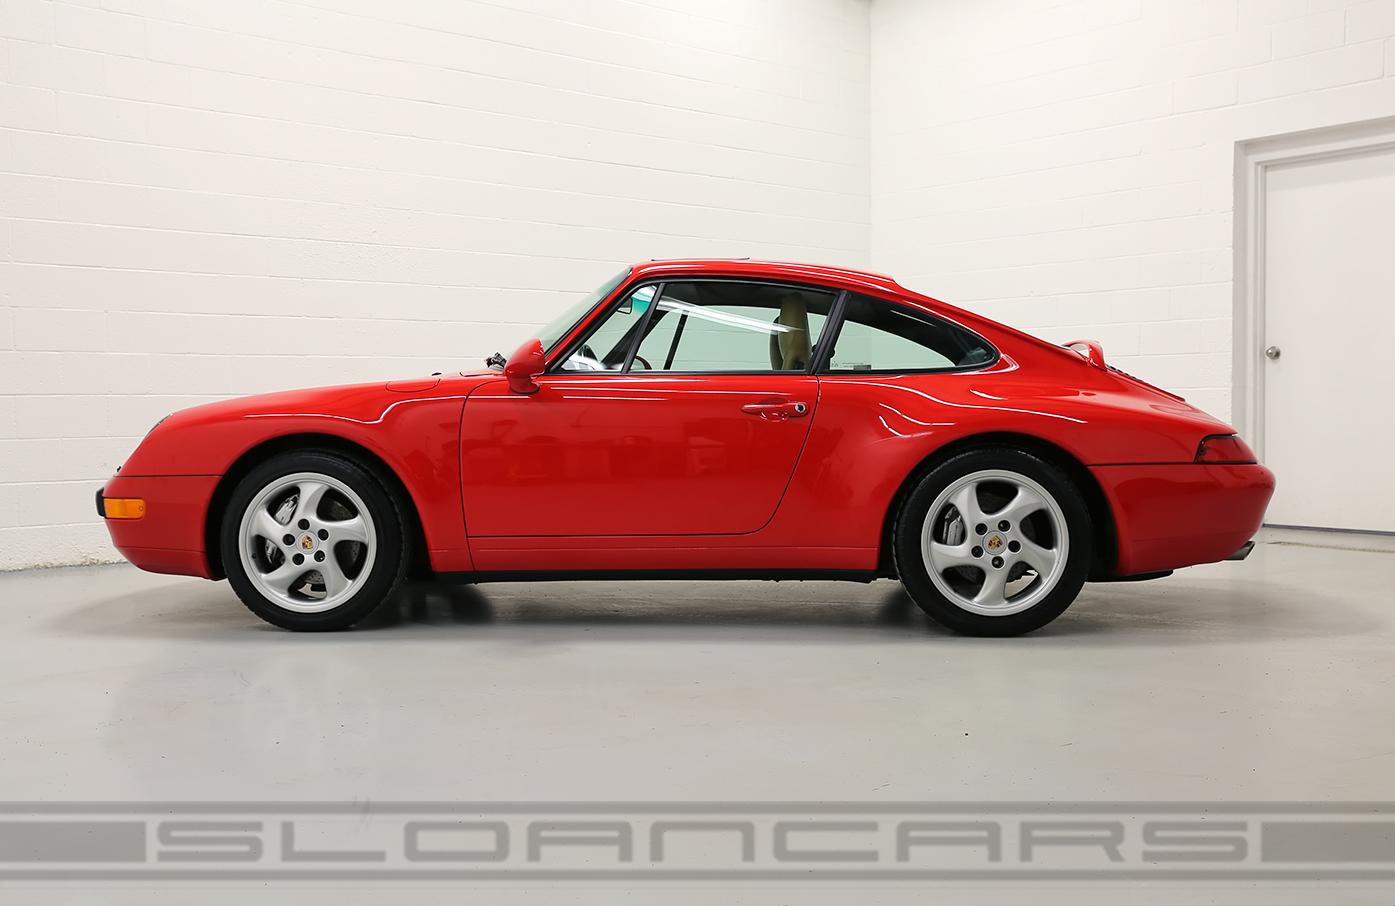 1995 Porsche 993 Carrera 4 Guards Red 28 196 Miles Sloan